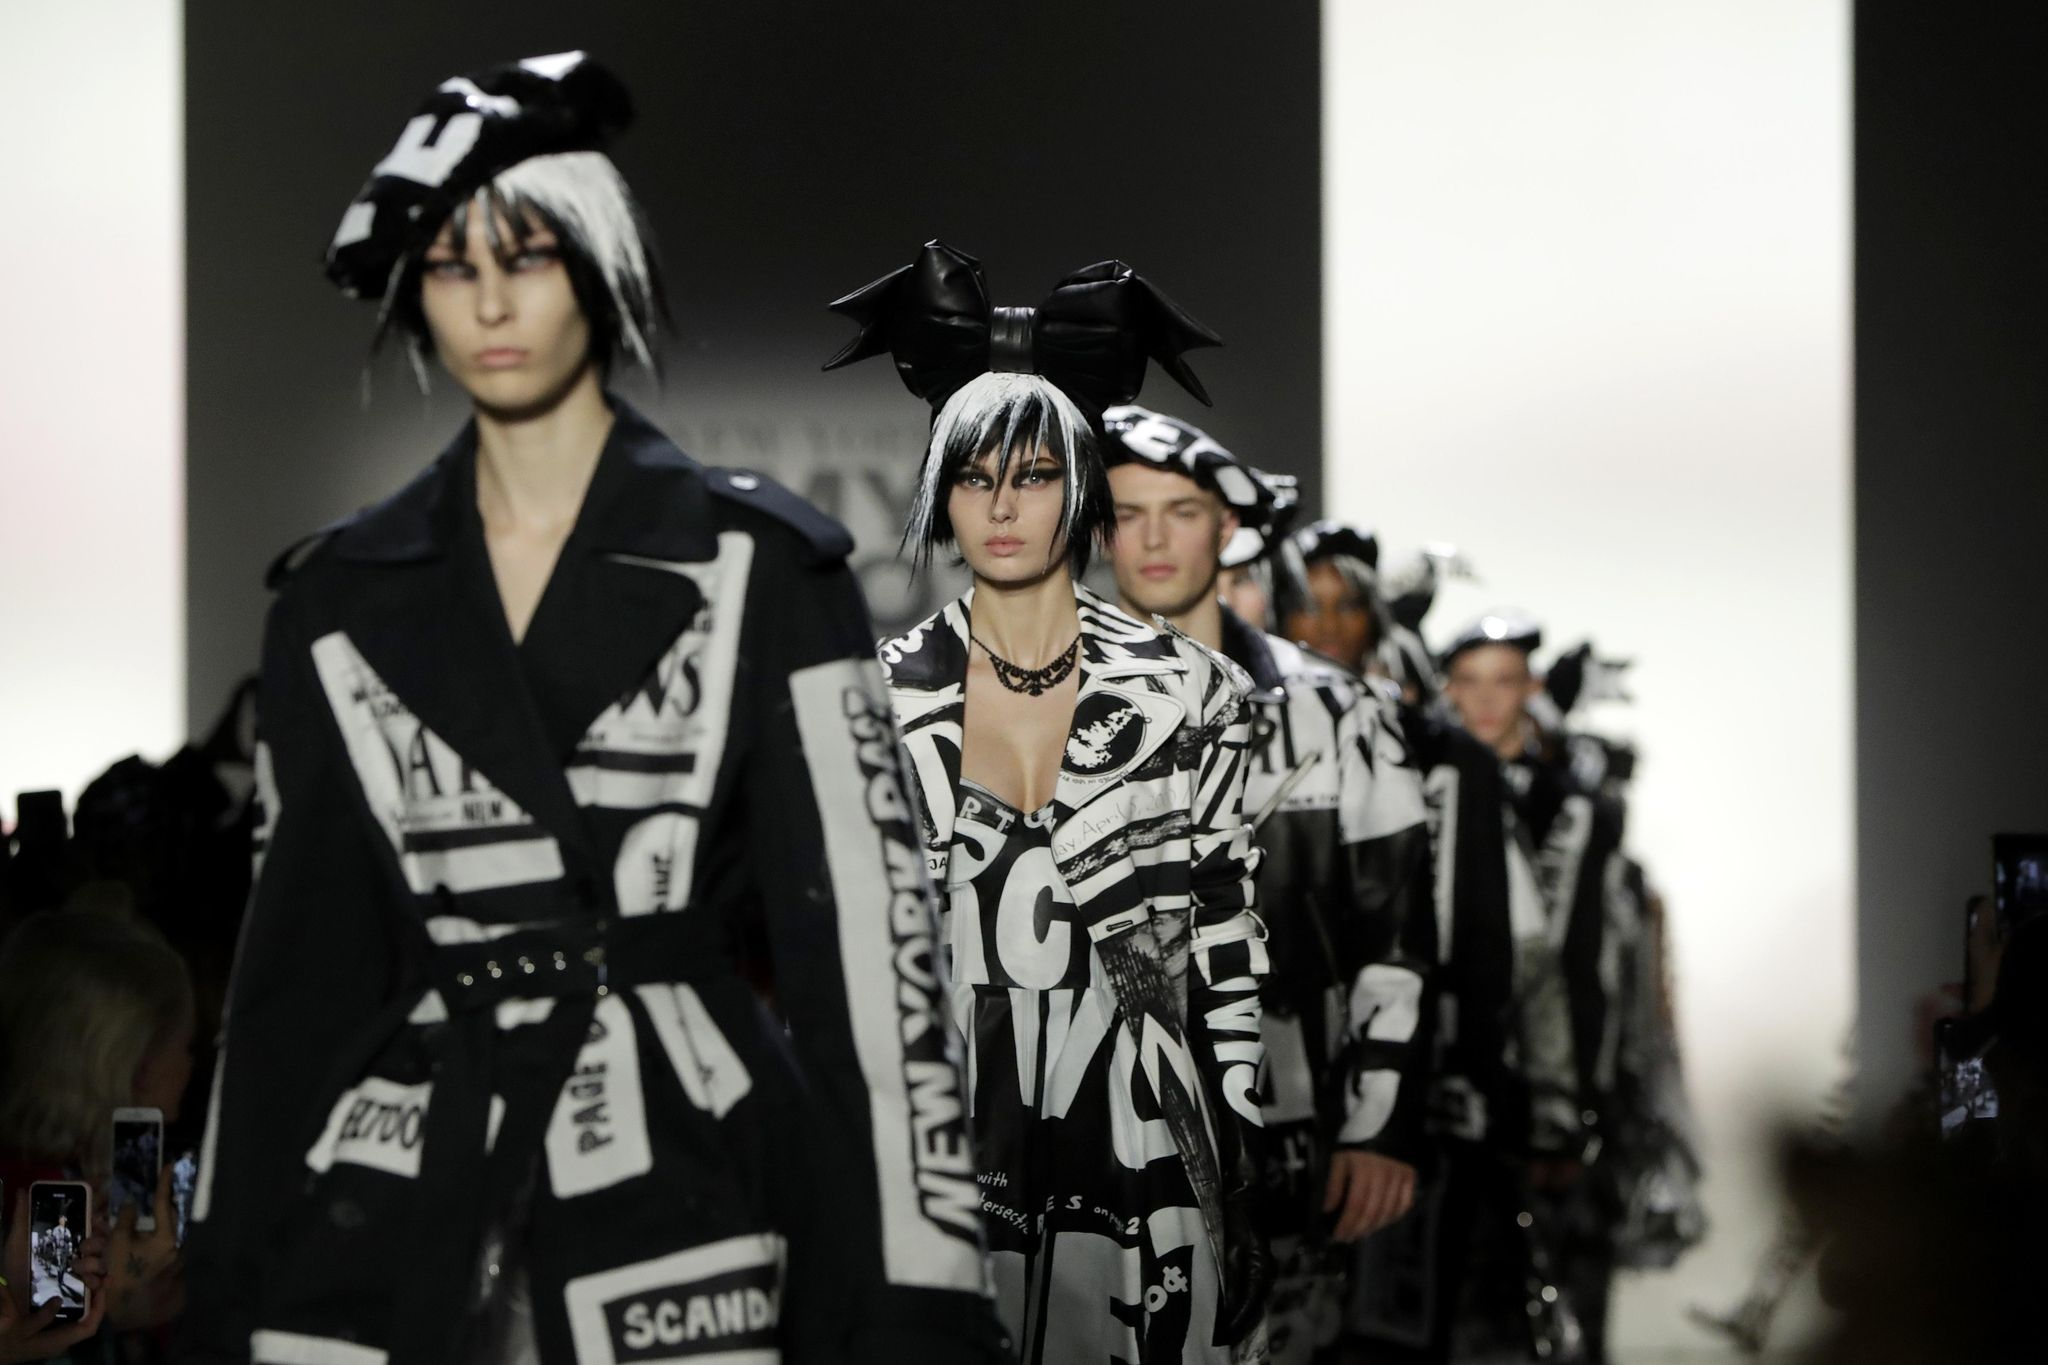 Fashion designer draws inspiration from media: 'Salacious news, false assumptions, clickbait'